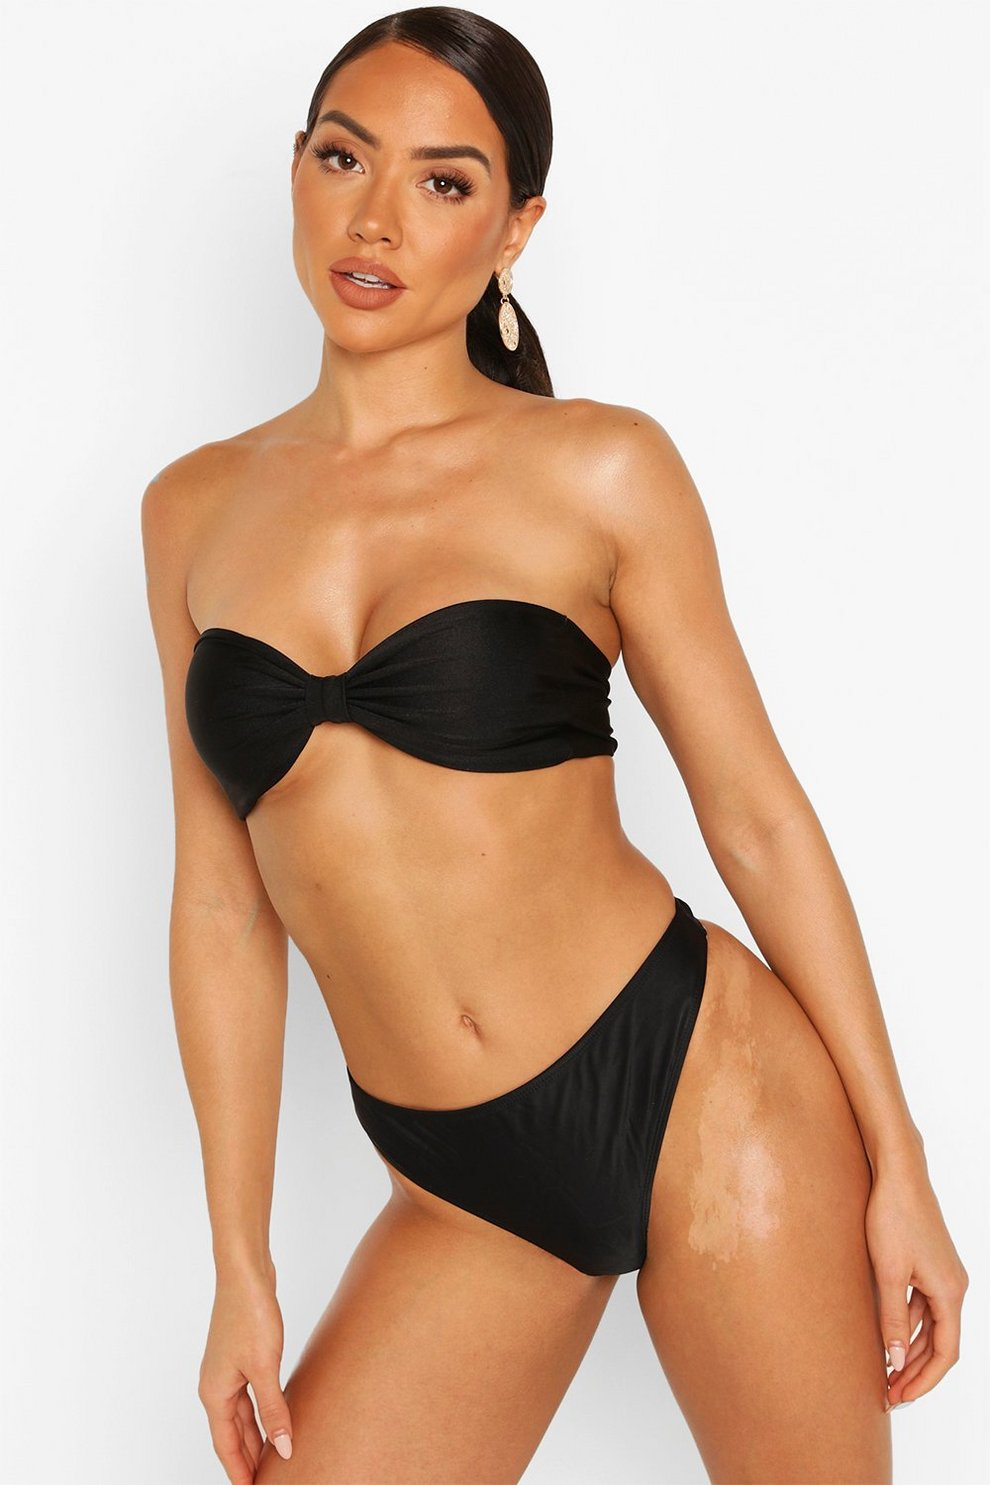 Can not redhead in a thong bikini